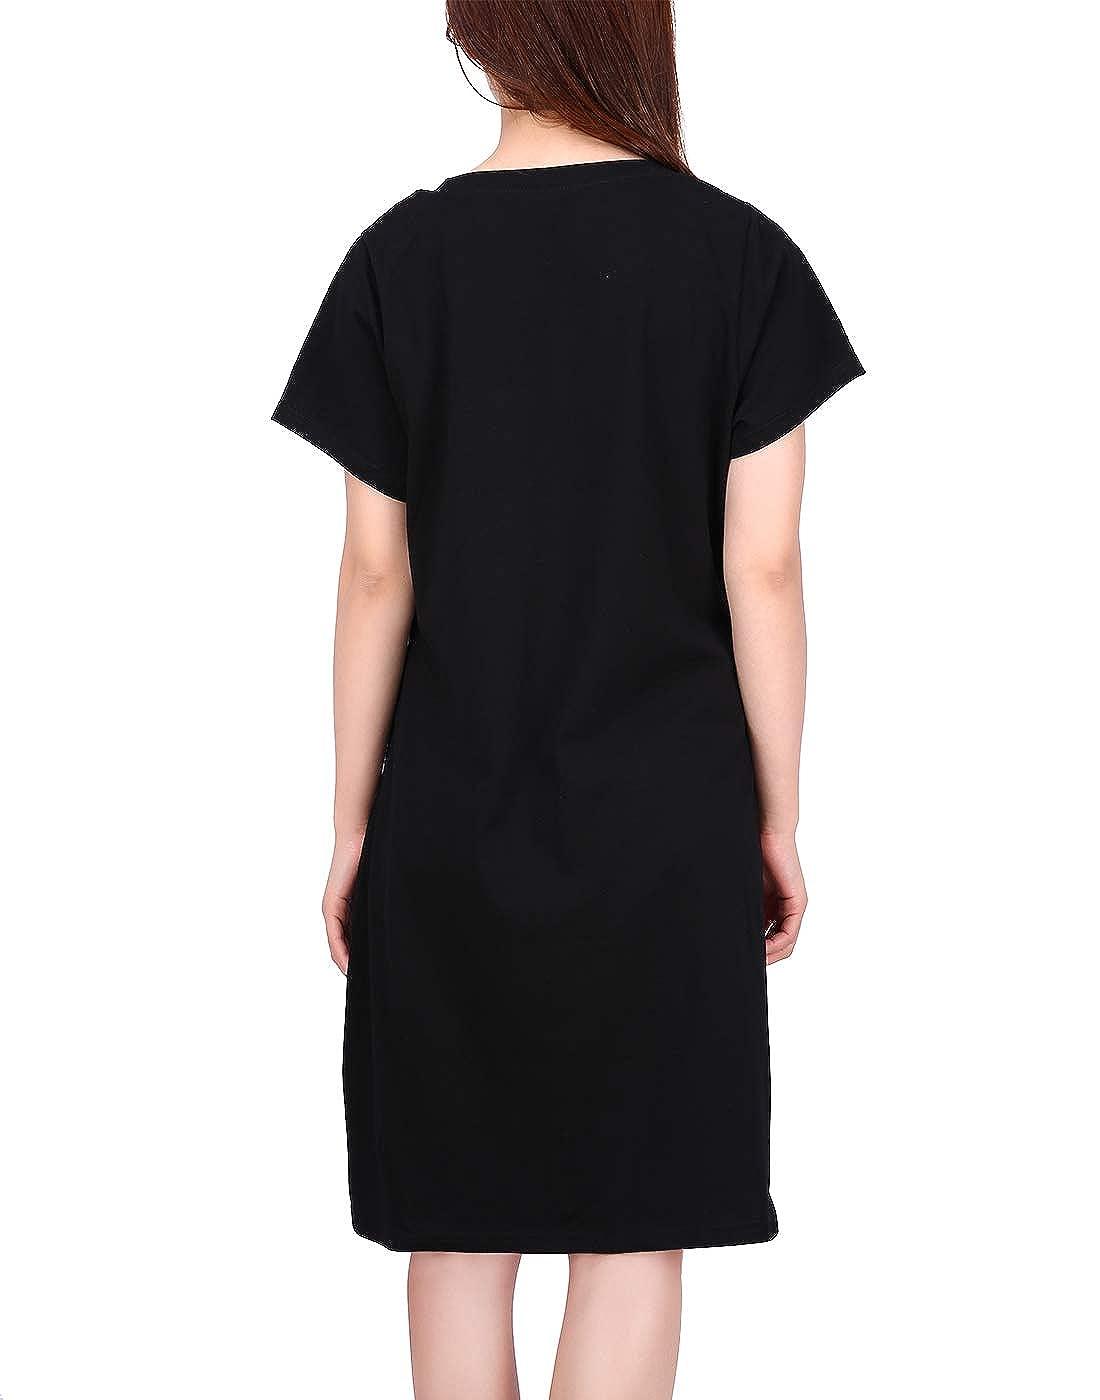 HDE Women s Sleep Shirt Dress Short Sleeve Nightgown Pajama Oversized  Nightshirt at Amazon Women s Clothing store  397a7a9ed